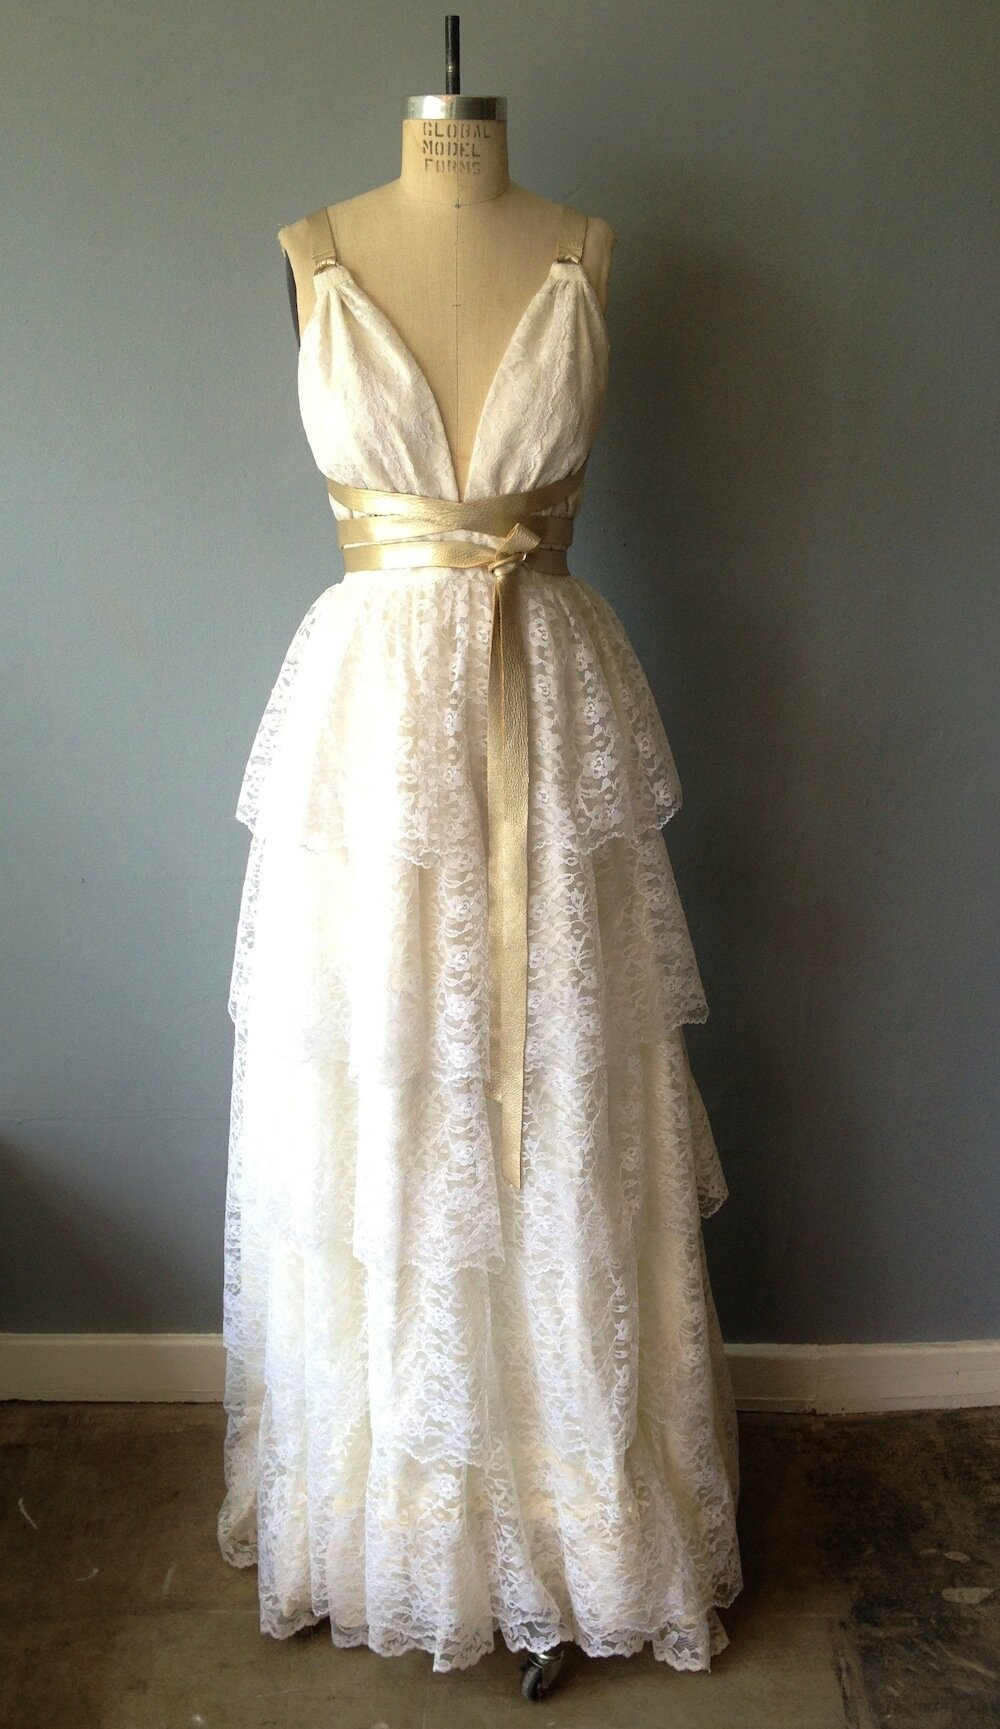 timeless retro wedding dresses for your vintage dream wedding